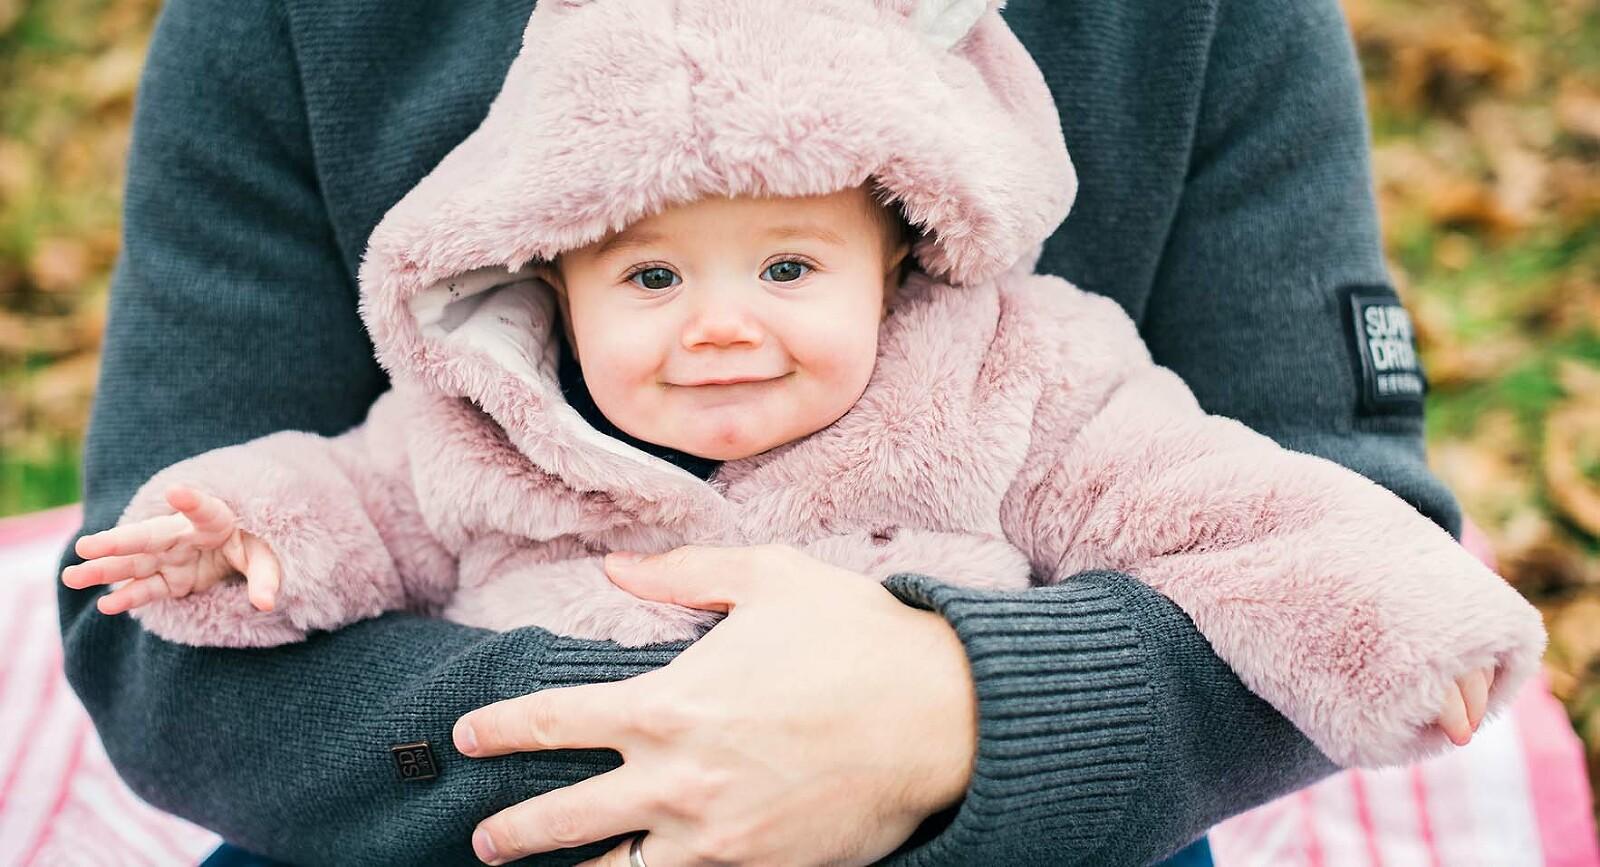 Baby smiling during family photo shoot Farnham